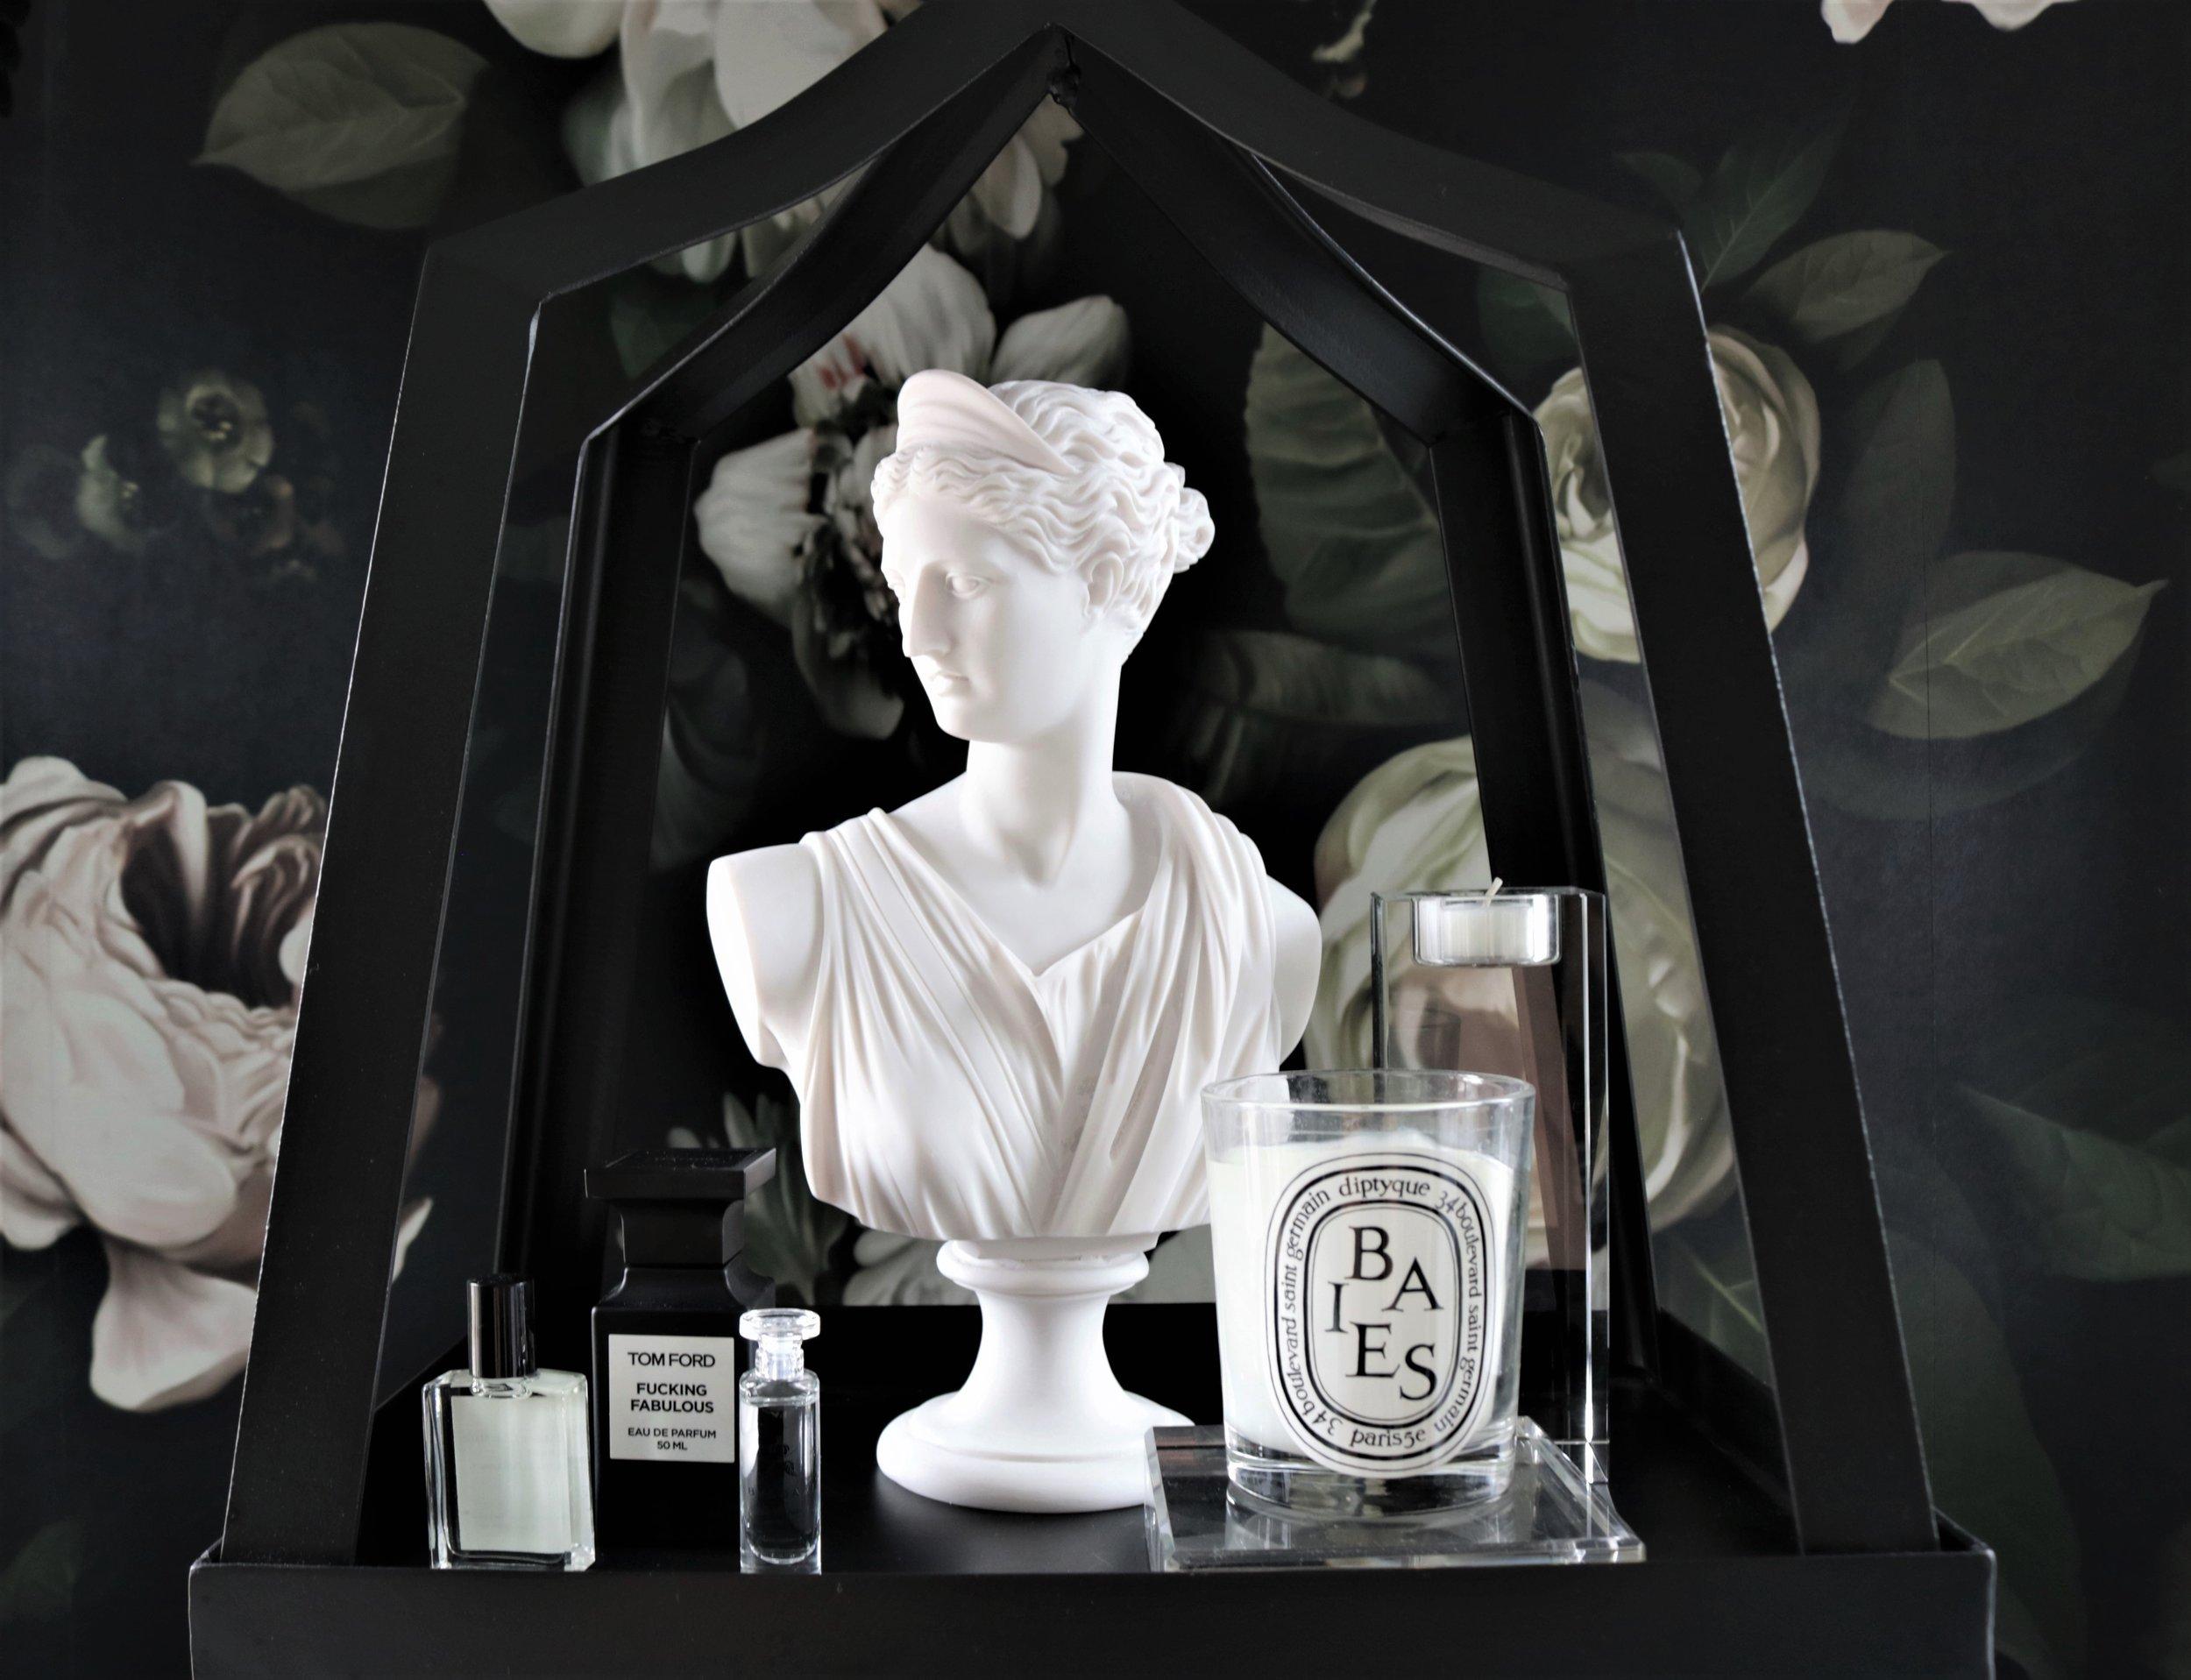 Kelle Dame Interiors Etagere Master Bathroom Decor.jpg